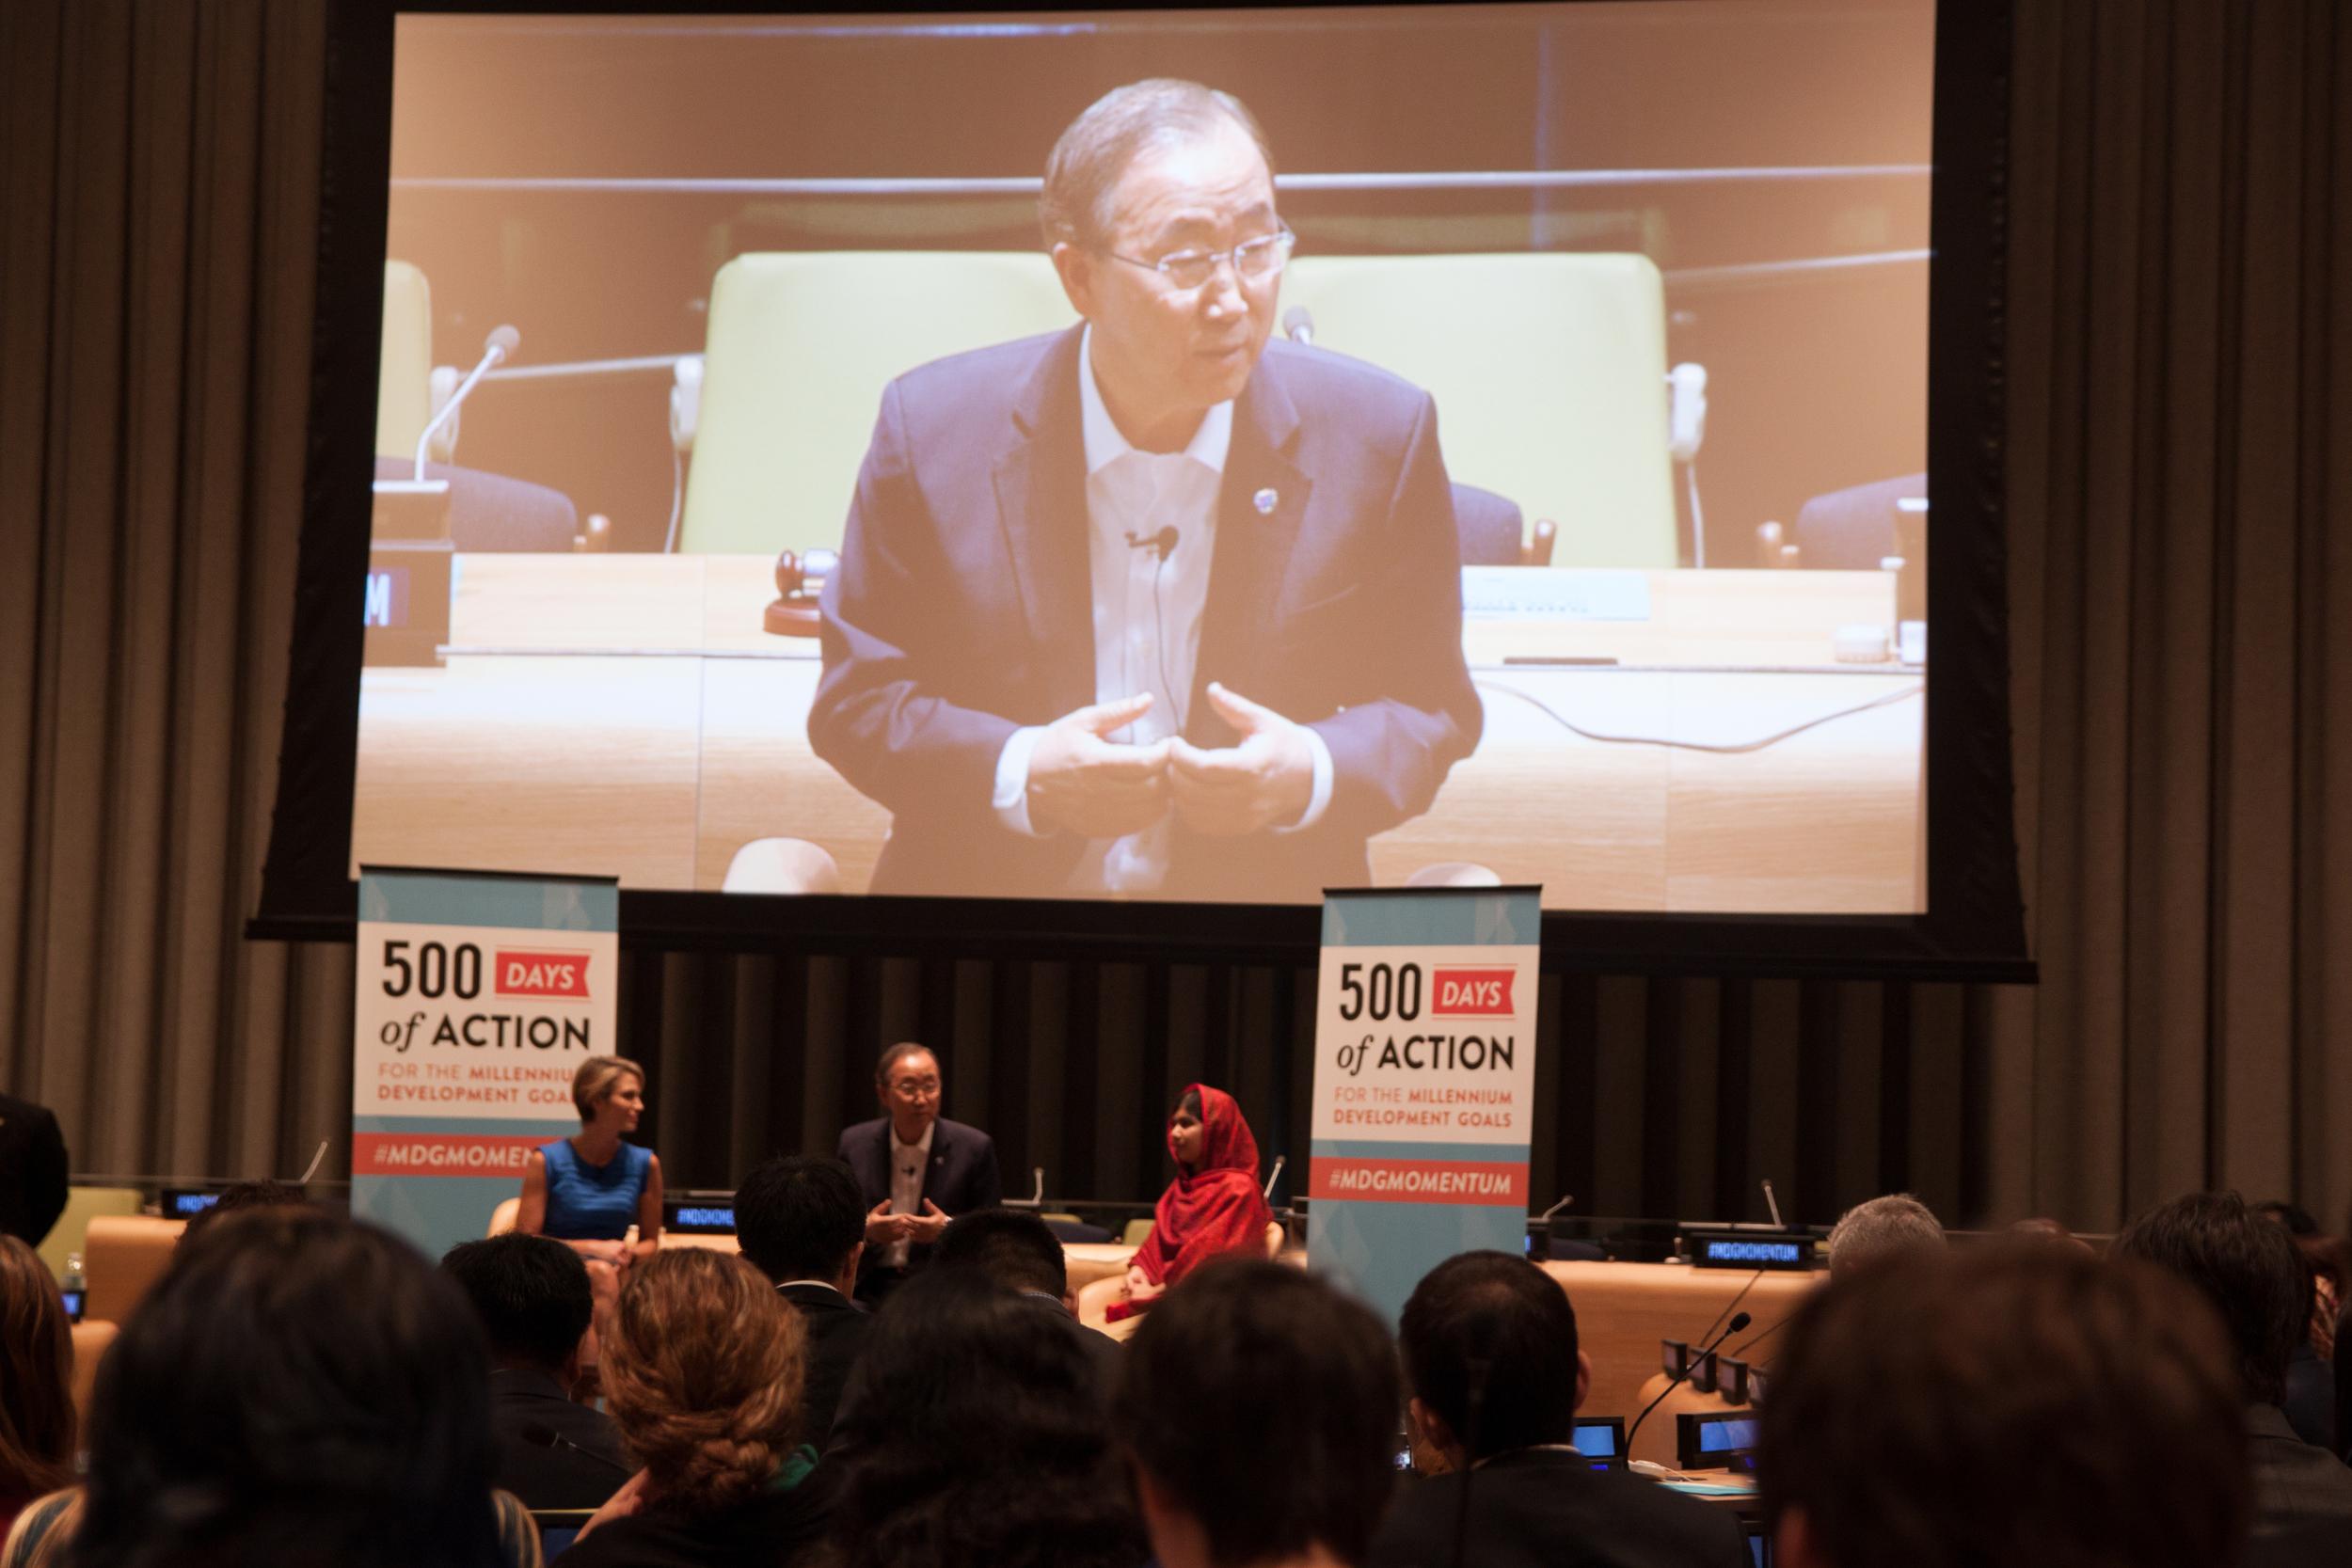 Secretary General Ban Ki-moon